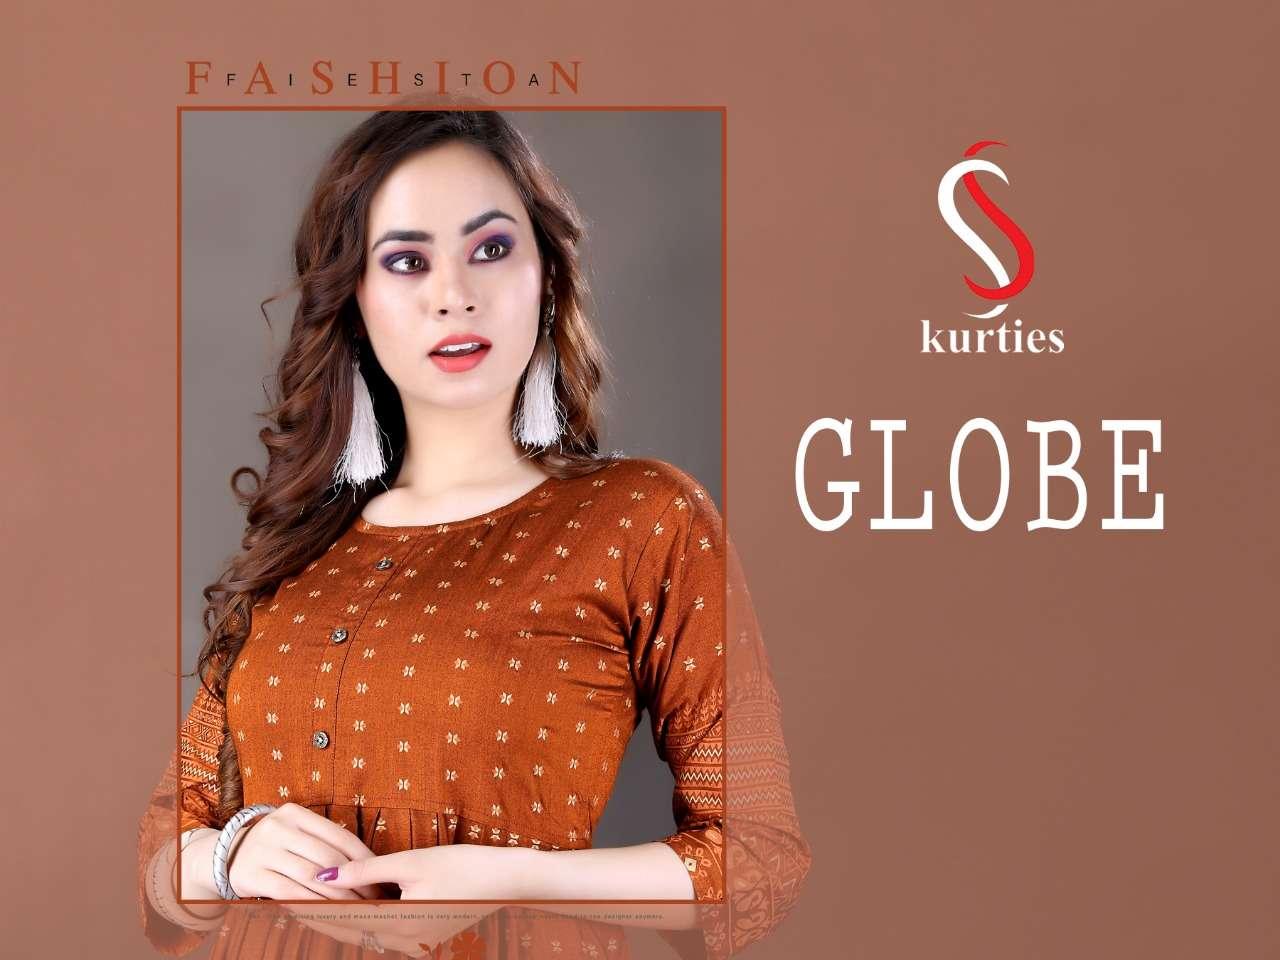 Globe by ss kurtis heavy rayon kurti Catalog Collection Wholesaler Lowest Best Price In Ahmedabad Surat Chennai India Uk Usa Malaysia Singapore Canada Australia